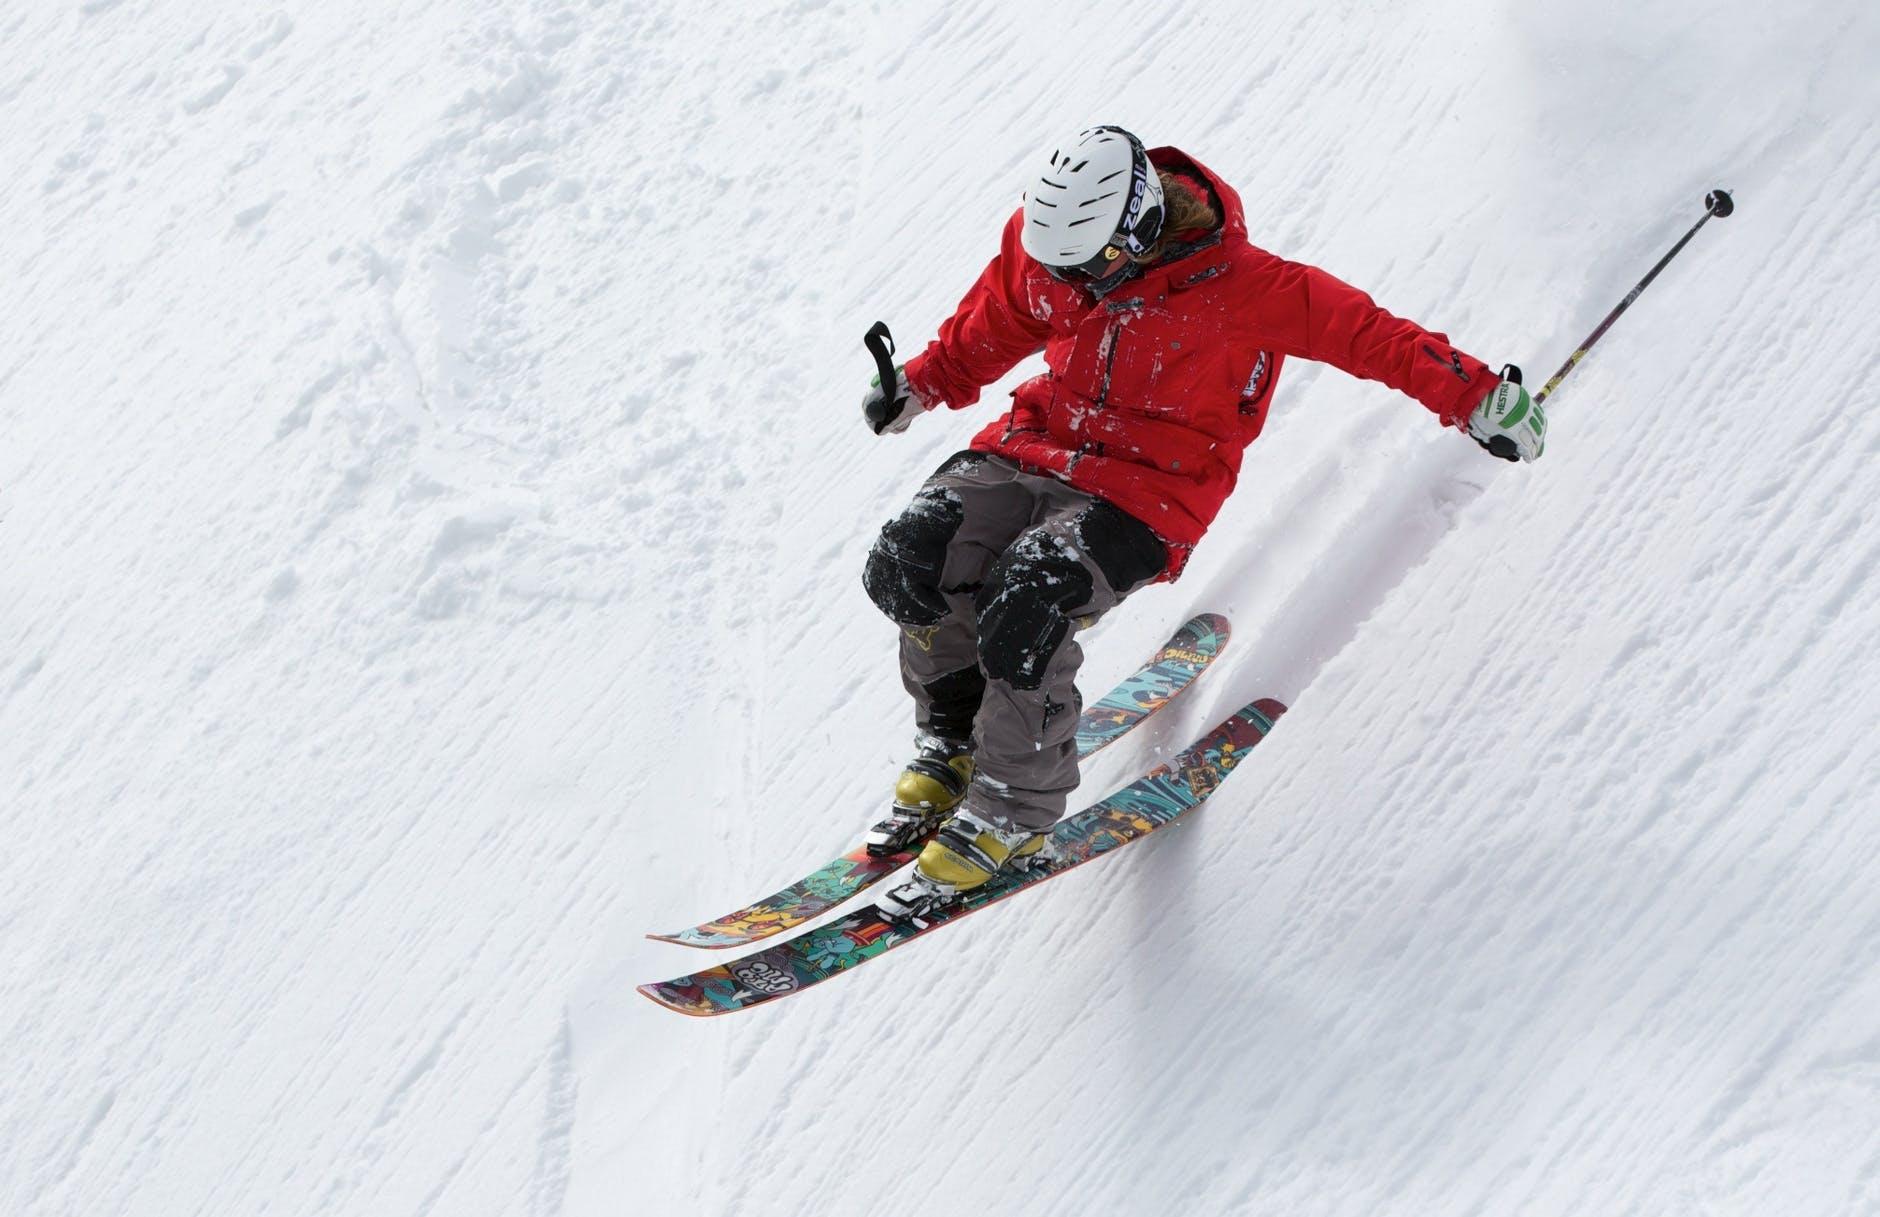 5 Tips on Planning Ski Trips for Beginners